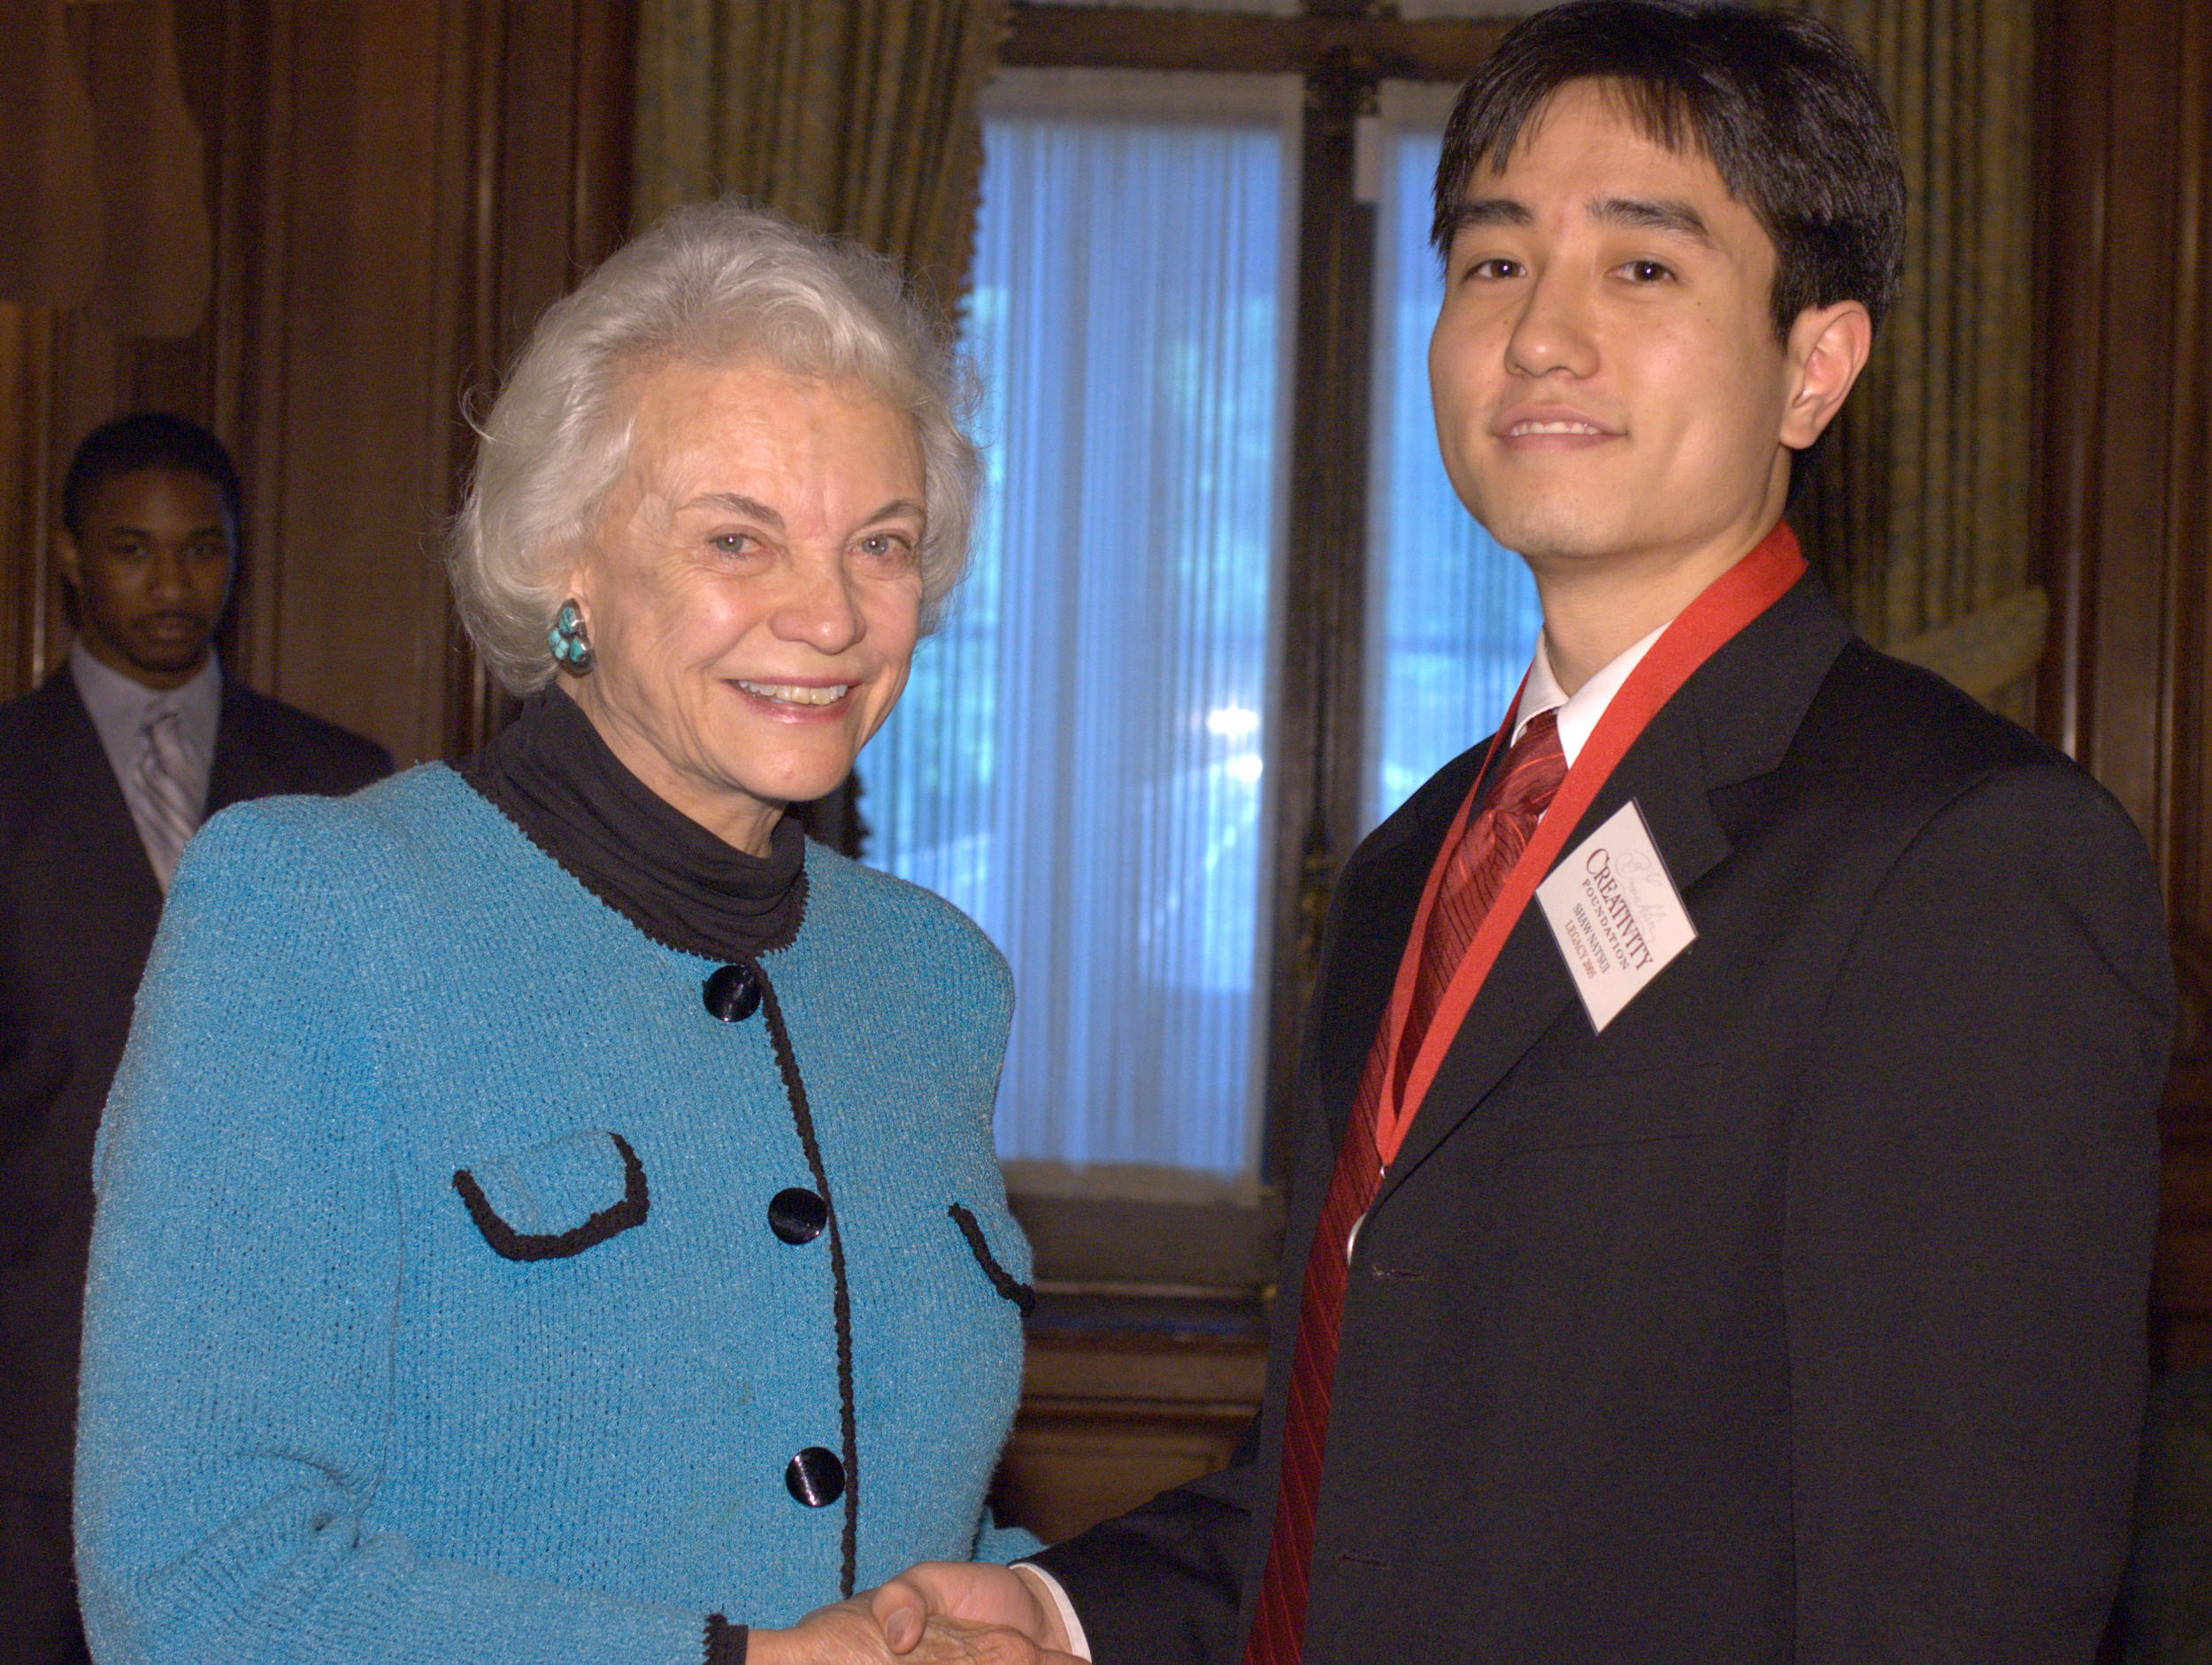 Shaw with 2005 Creativity Laureate Sandra Day O'Connor